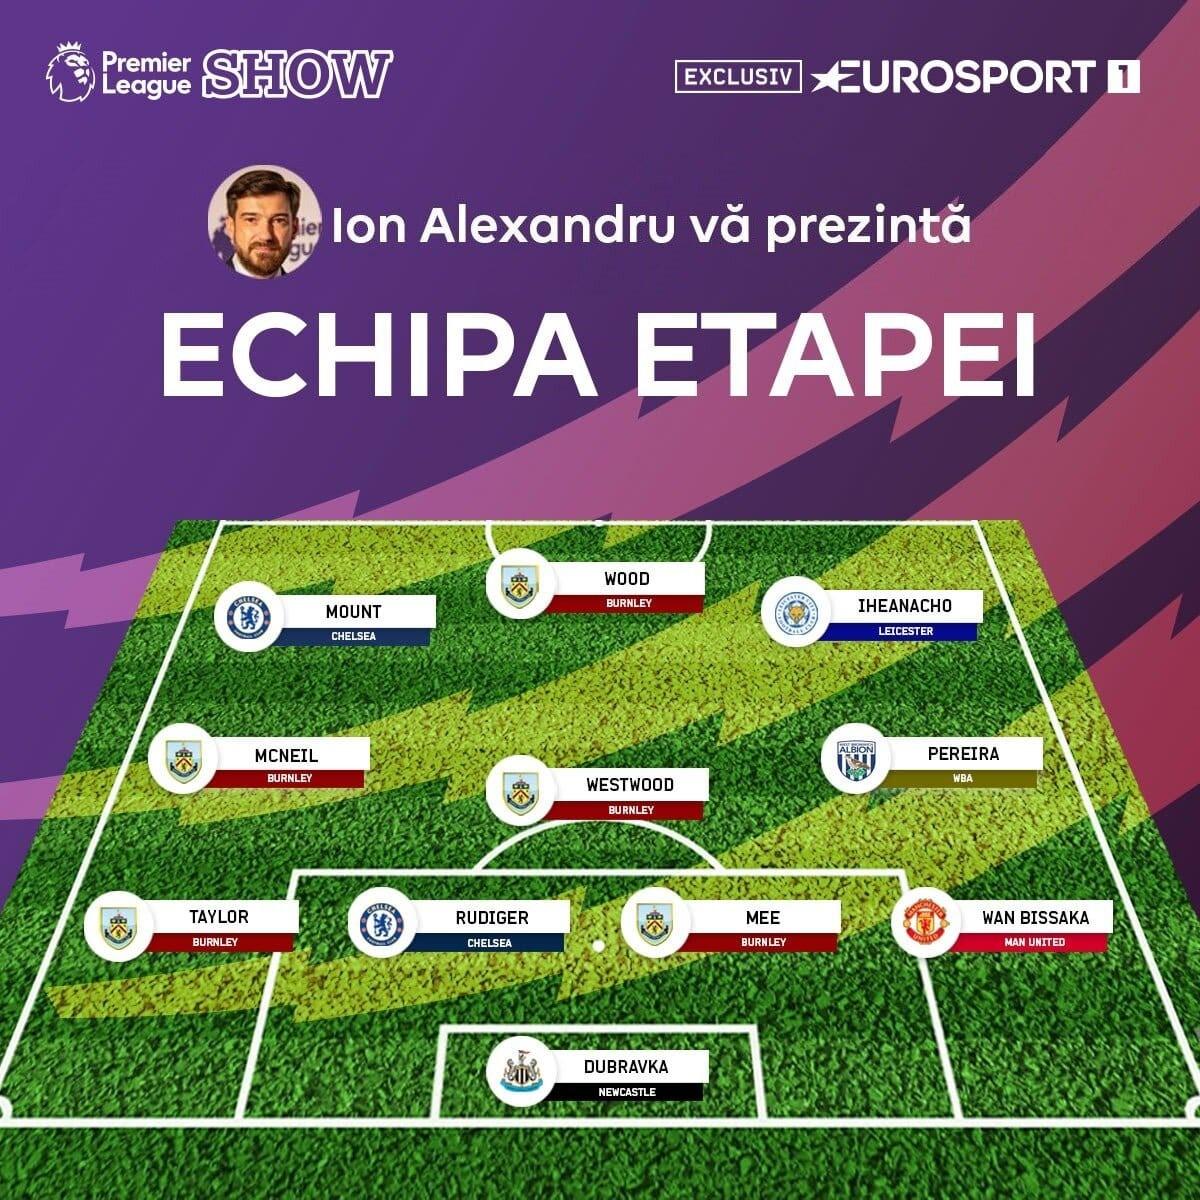 https://i.eurosport.com/2021/04/27/3122061.jpg